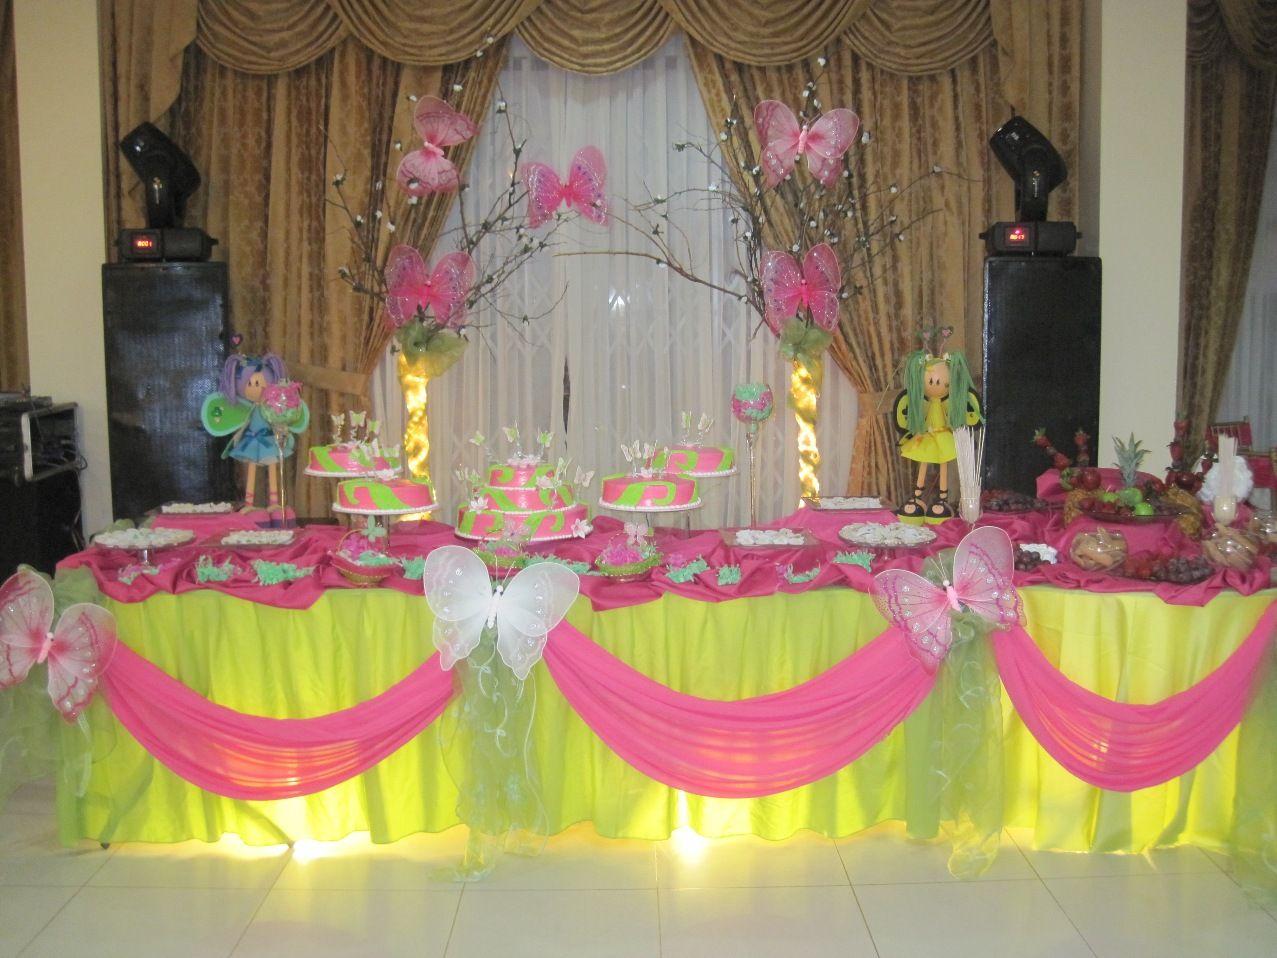 15 Anos Decorations Mesa: Xv Anos Decorations